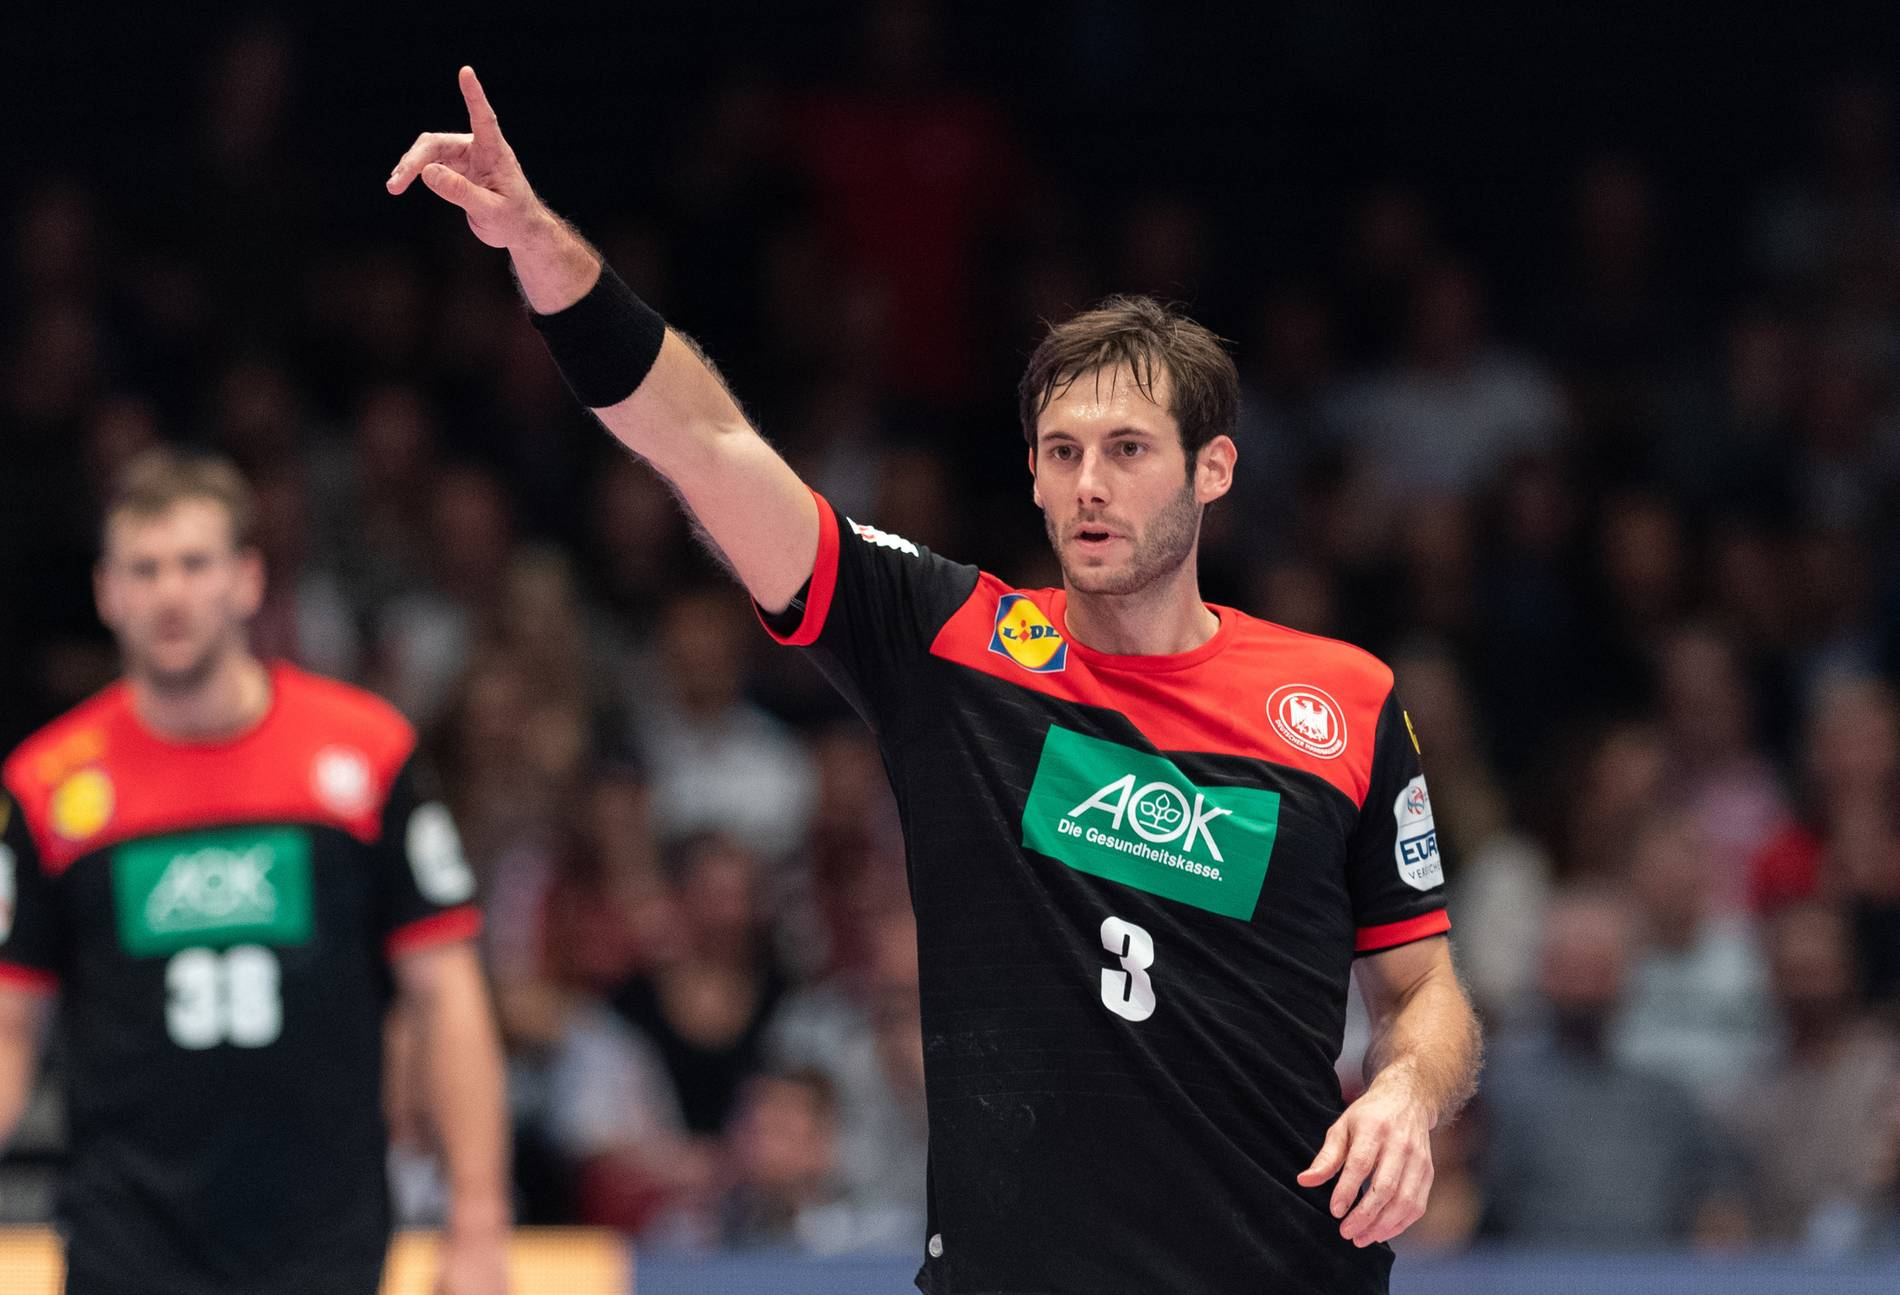 Handball Em übertragung 2021